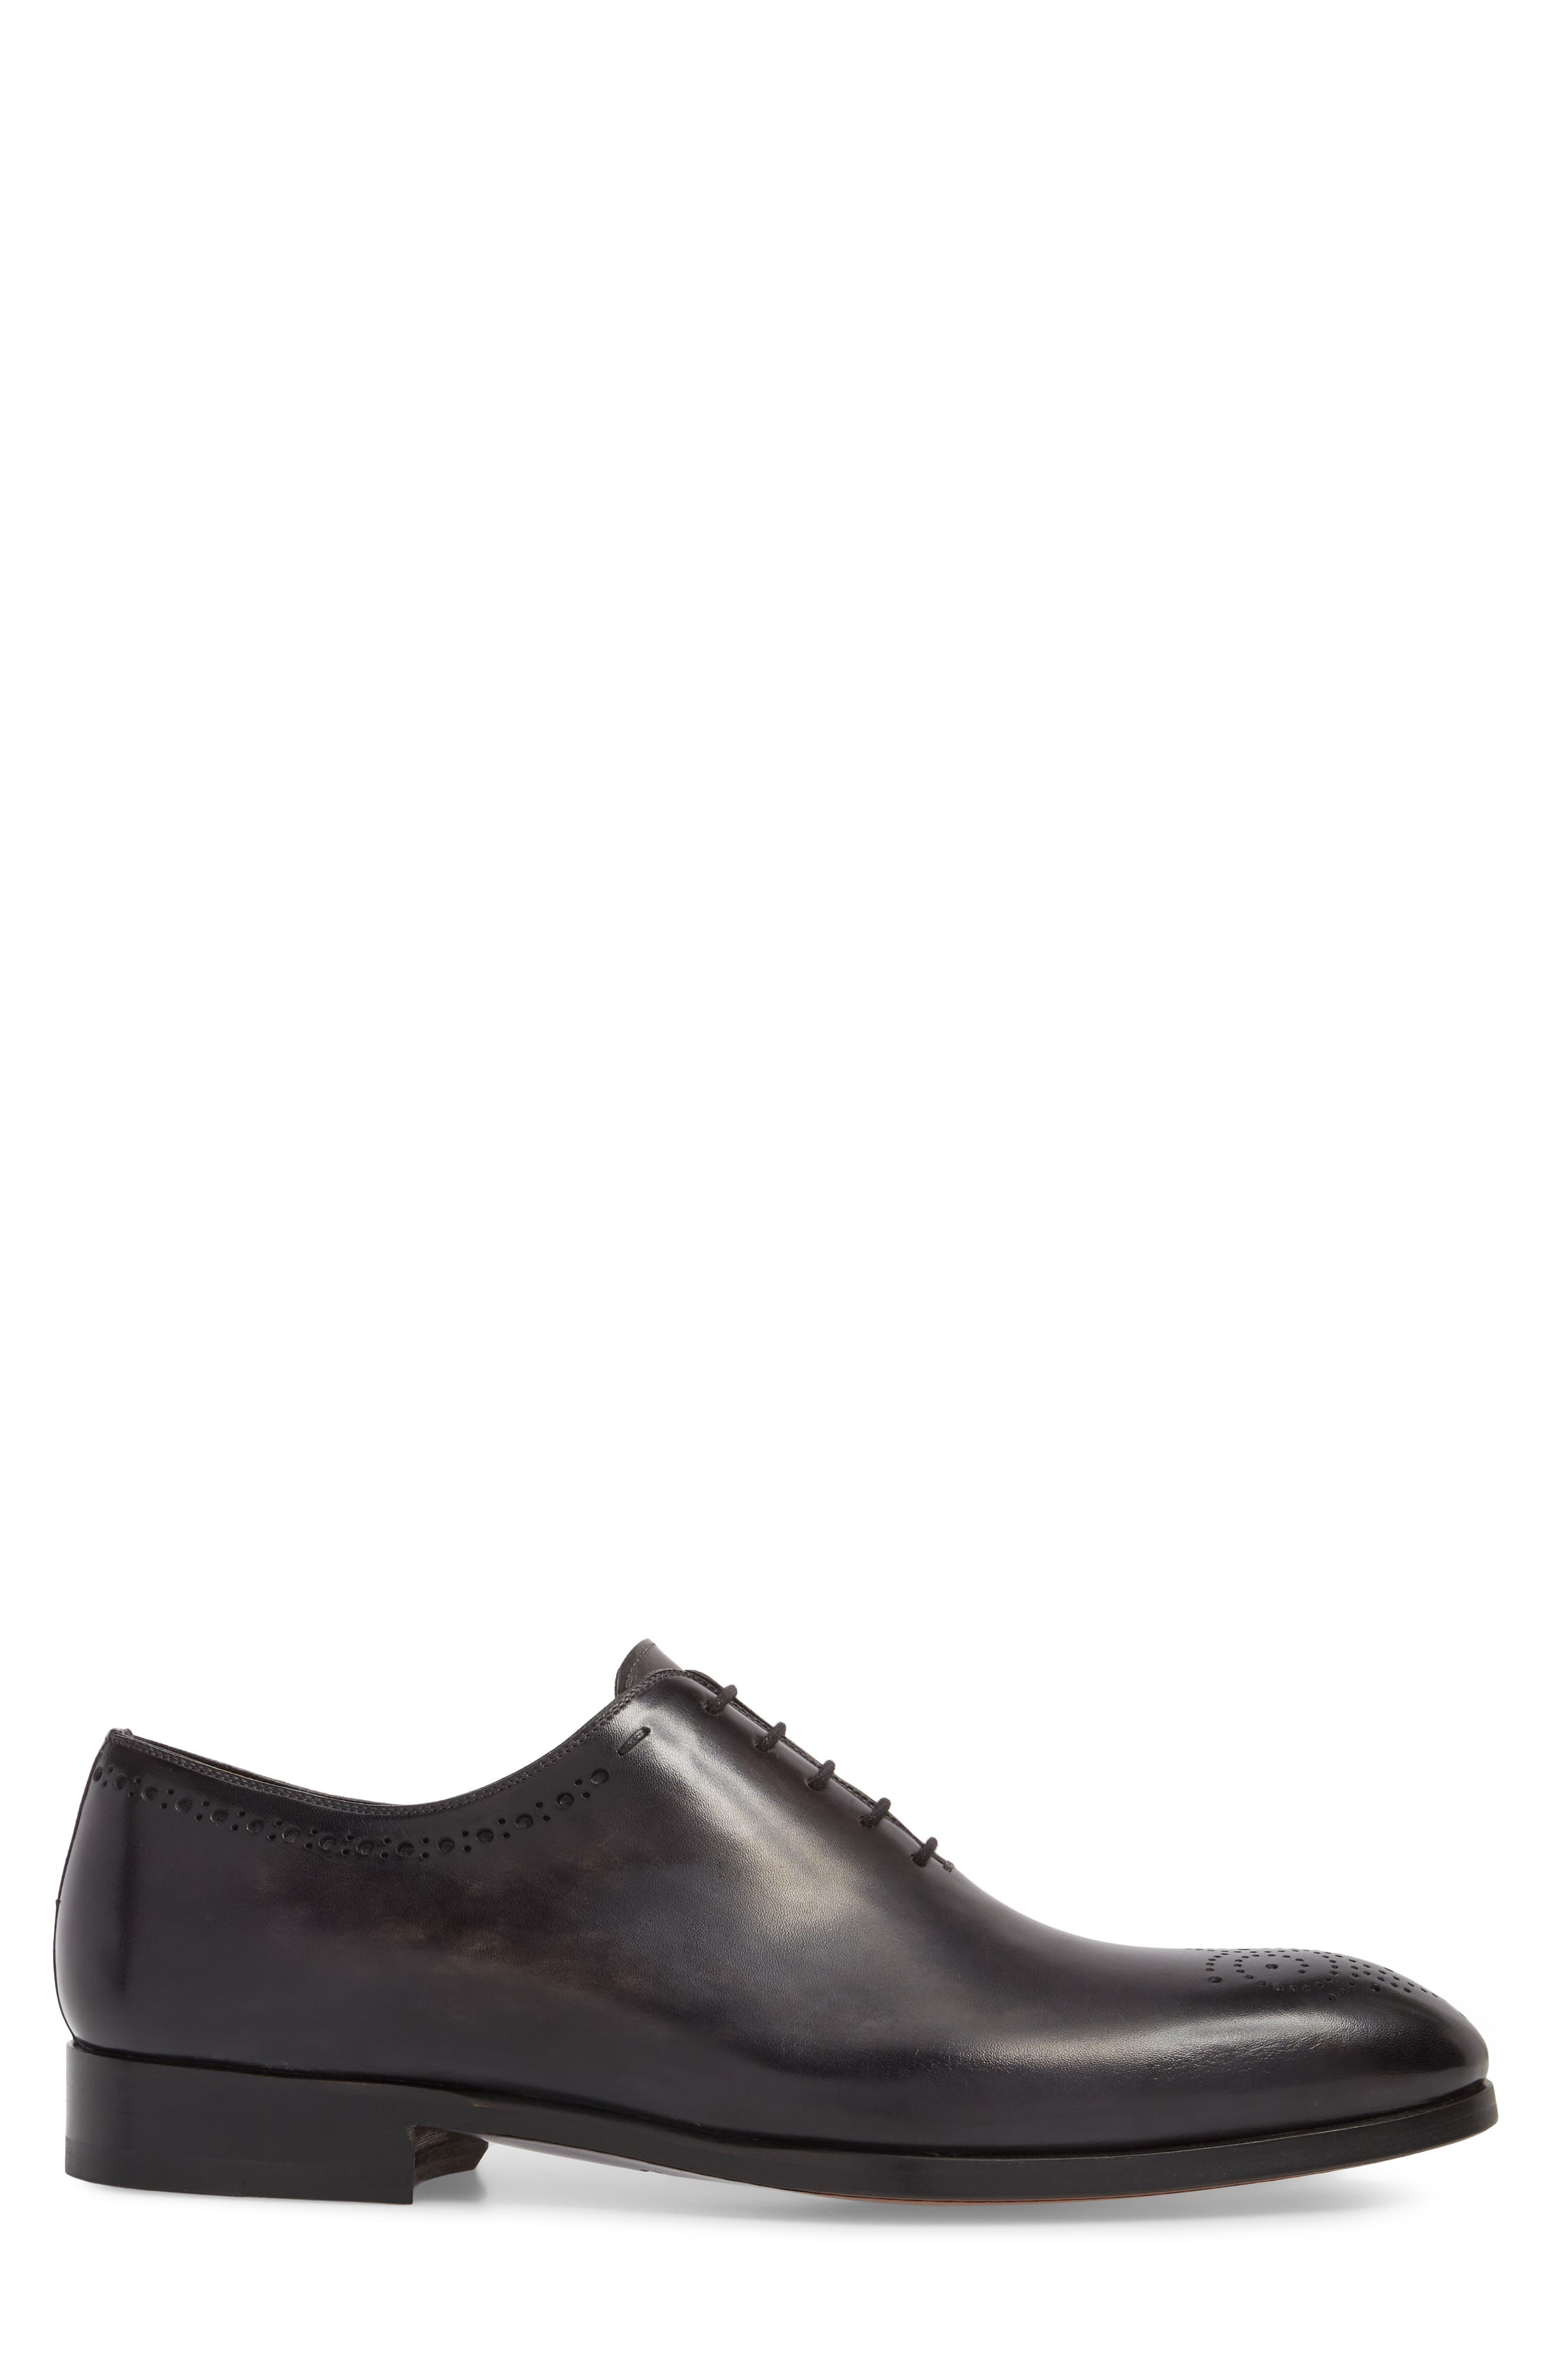 Paolo Brogued Whole Cut Shoe,                             Alternate thumbnail 3, color,                             020